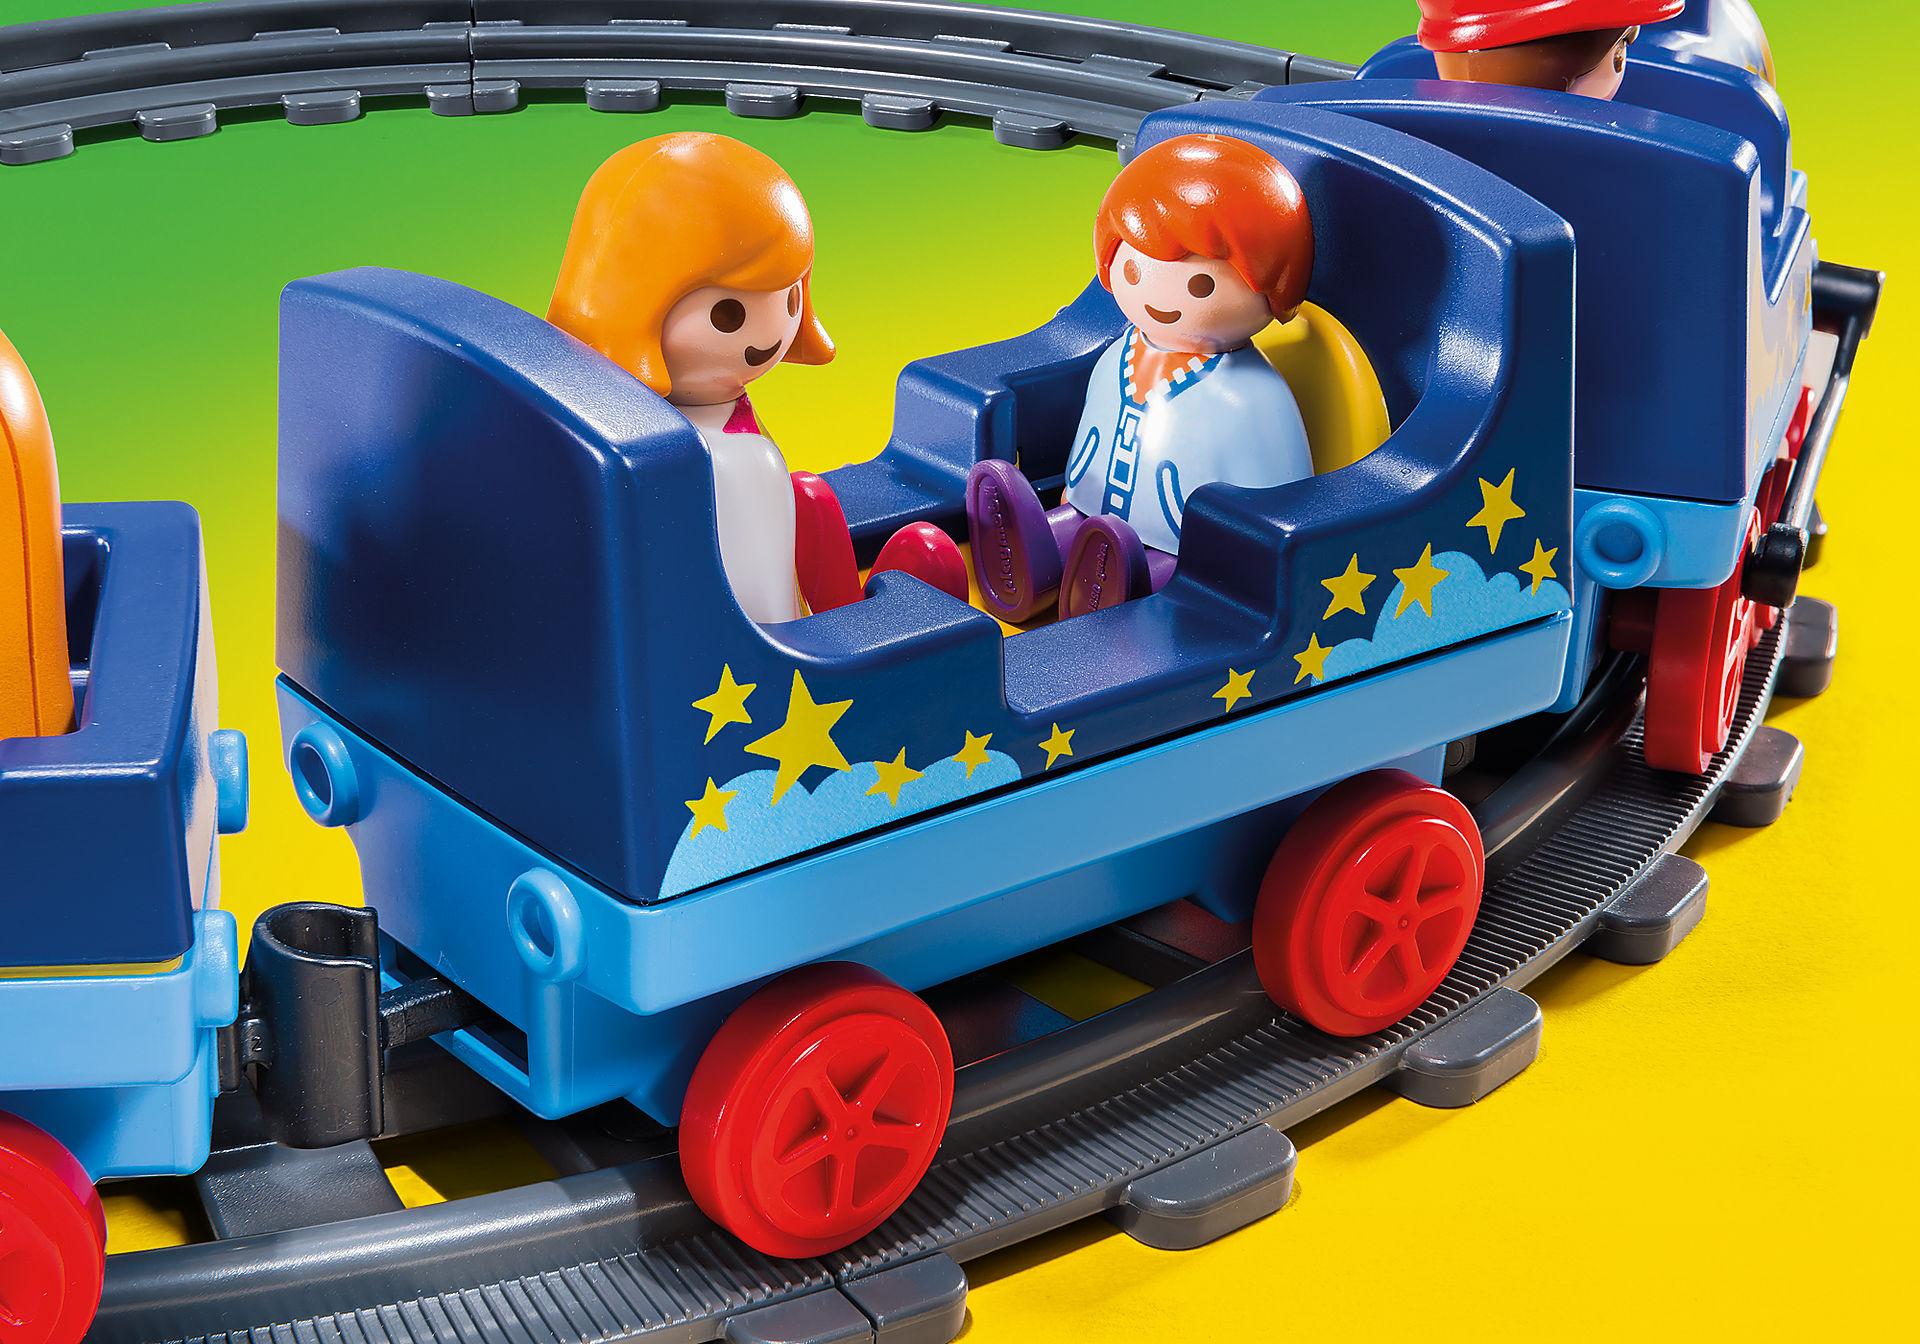 http://media.playmobil.com/i/playmobil/6880_product_extra1/Sterrentrein met passagiers